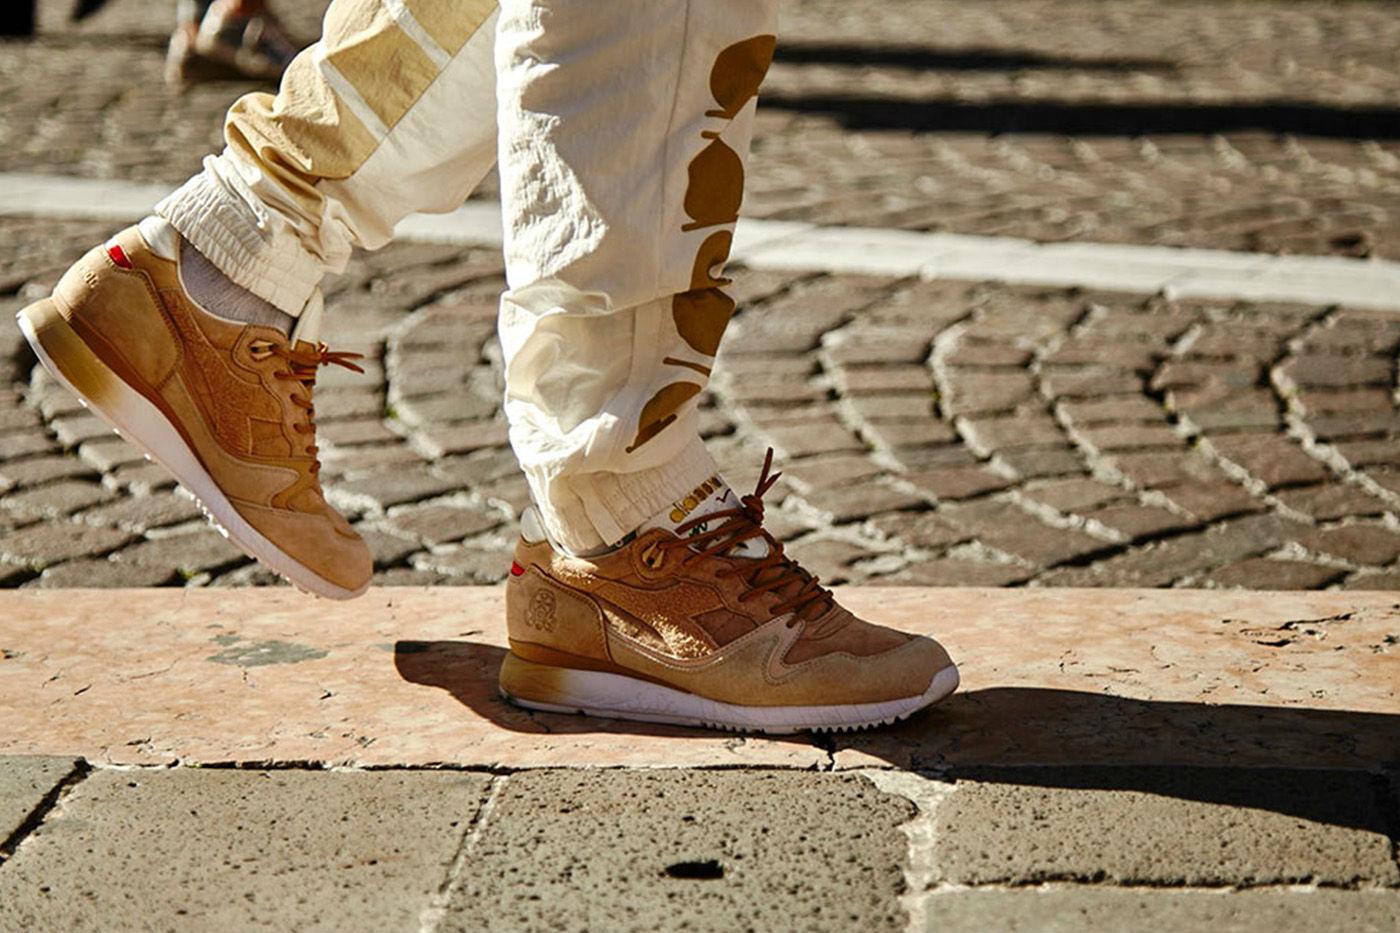 d15733b165 Footpatrol x Diadora V7000  Machiatto  · sneaker freaker ...